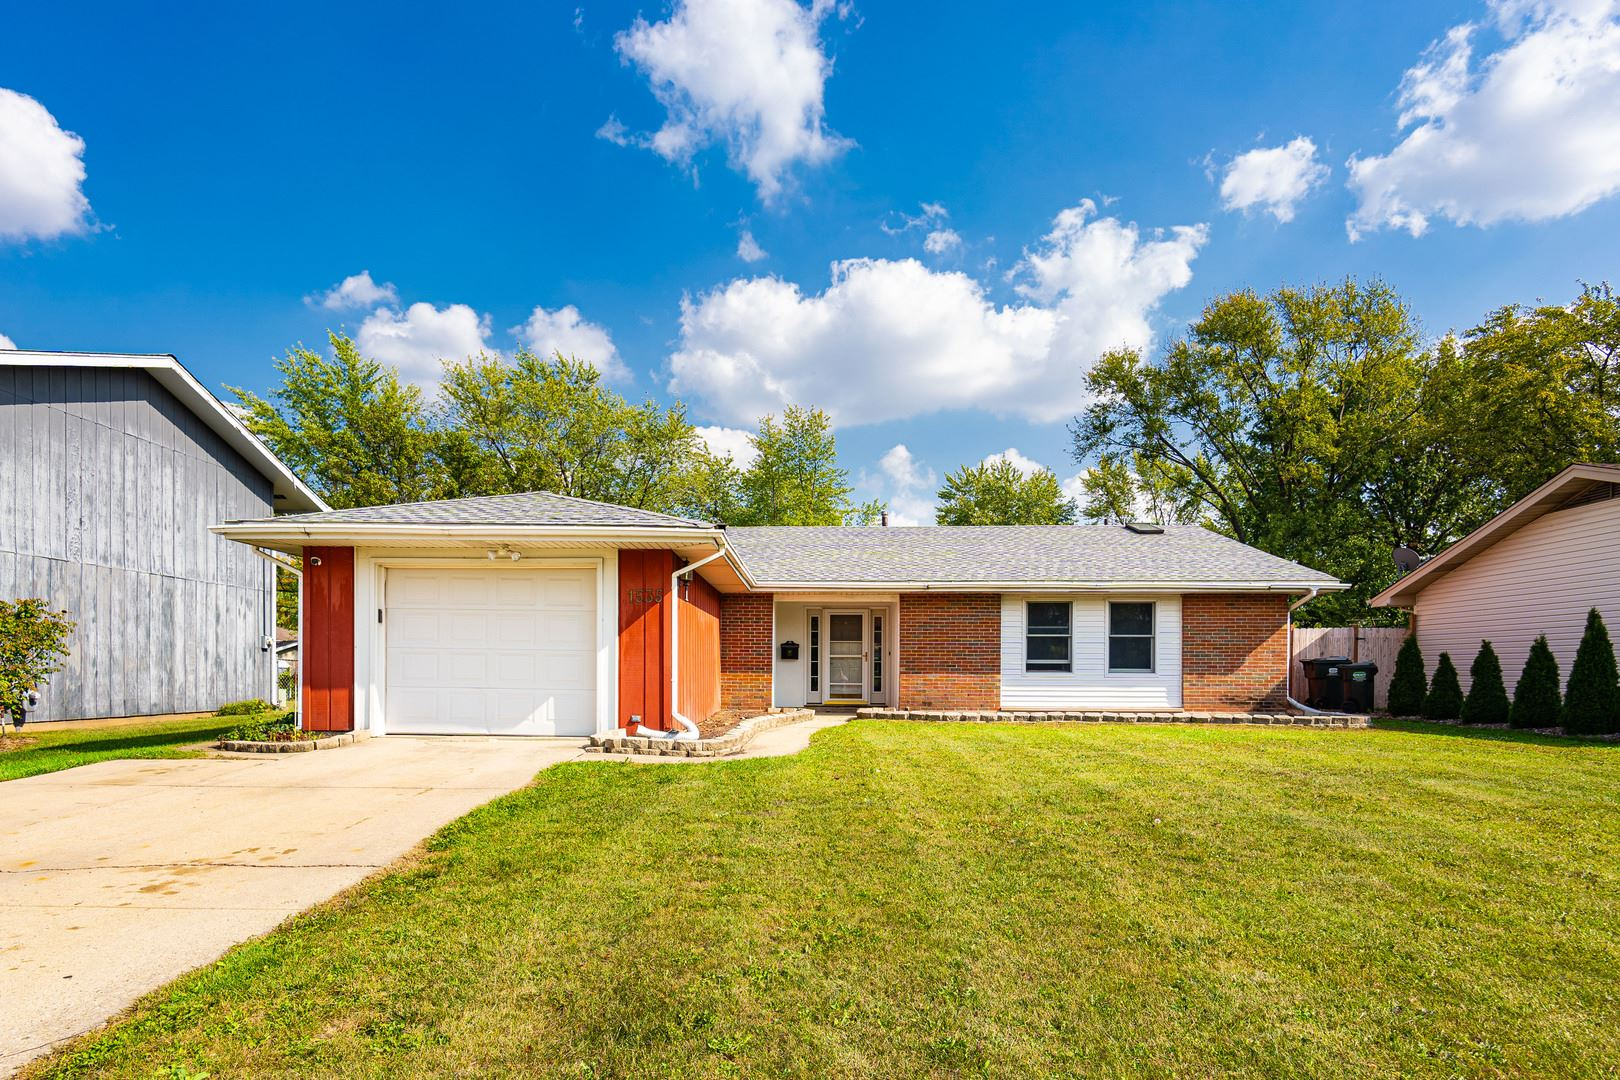 1535 Kingsdale Road, Hoffman Estates, IL 60169 - #: 11236899